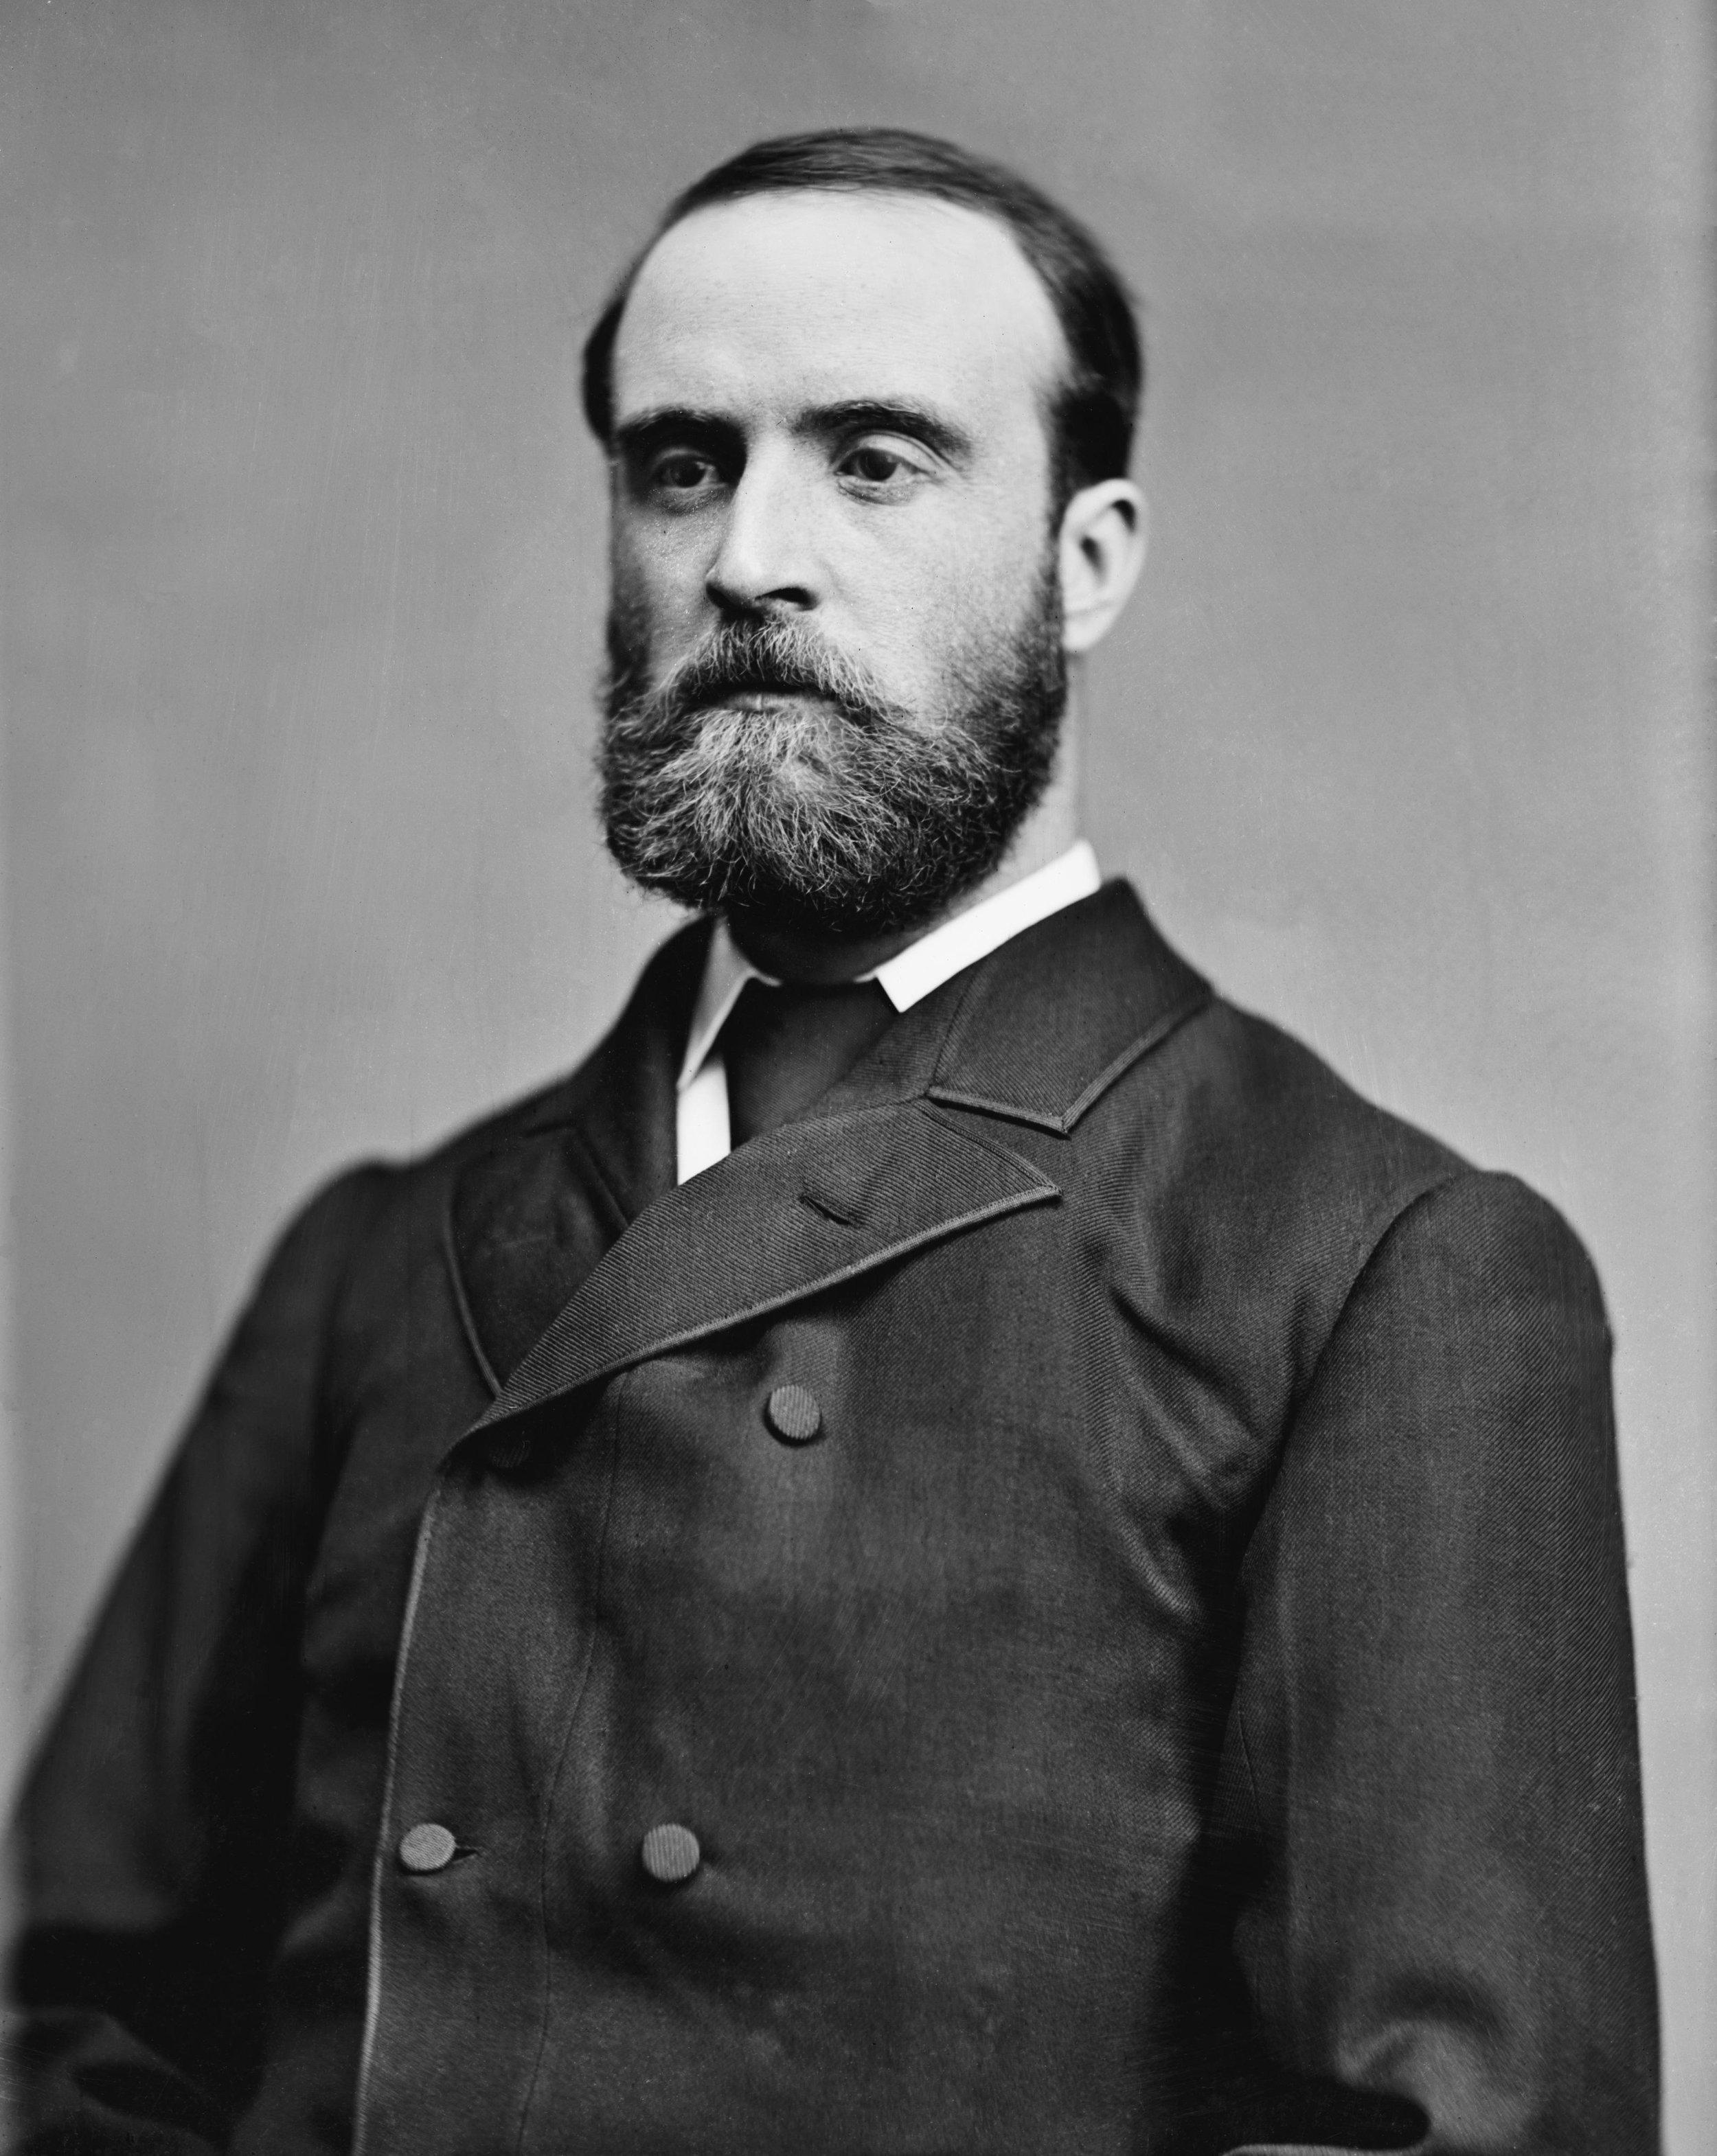 Charles Stewart Parnell (Mathew Brady/Library of Congress)